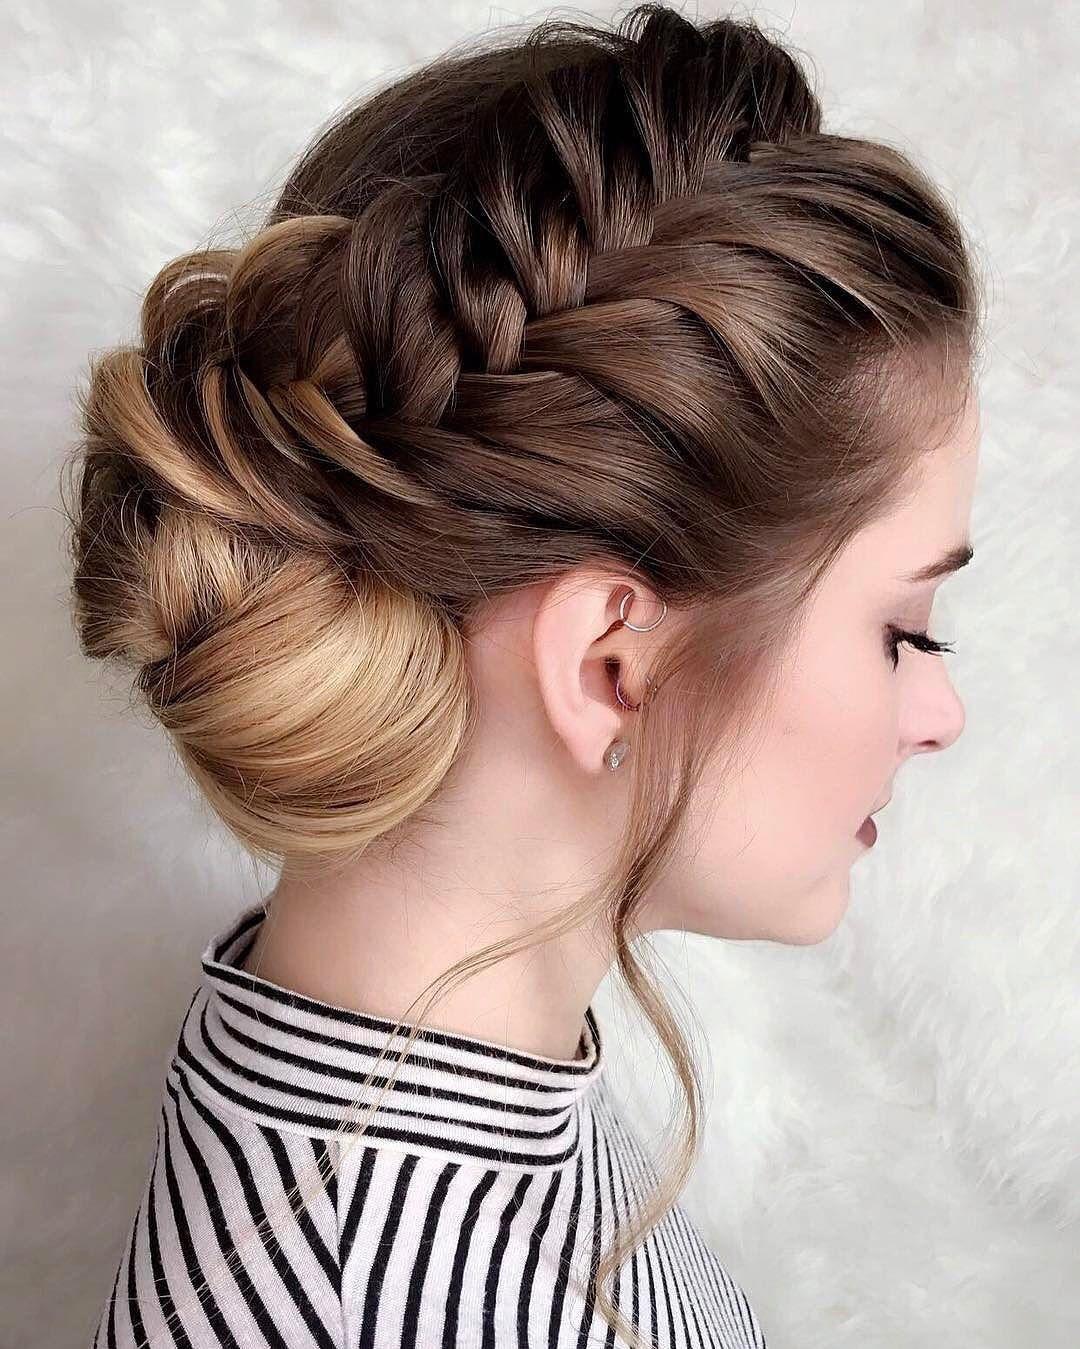 25 Really Beautiful French Braids Hairstyle Ideas Thrivenaija In 2020 Hair Styles Stylish Hair Womens Hairstyles